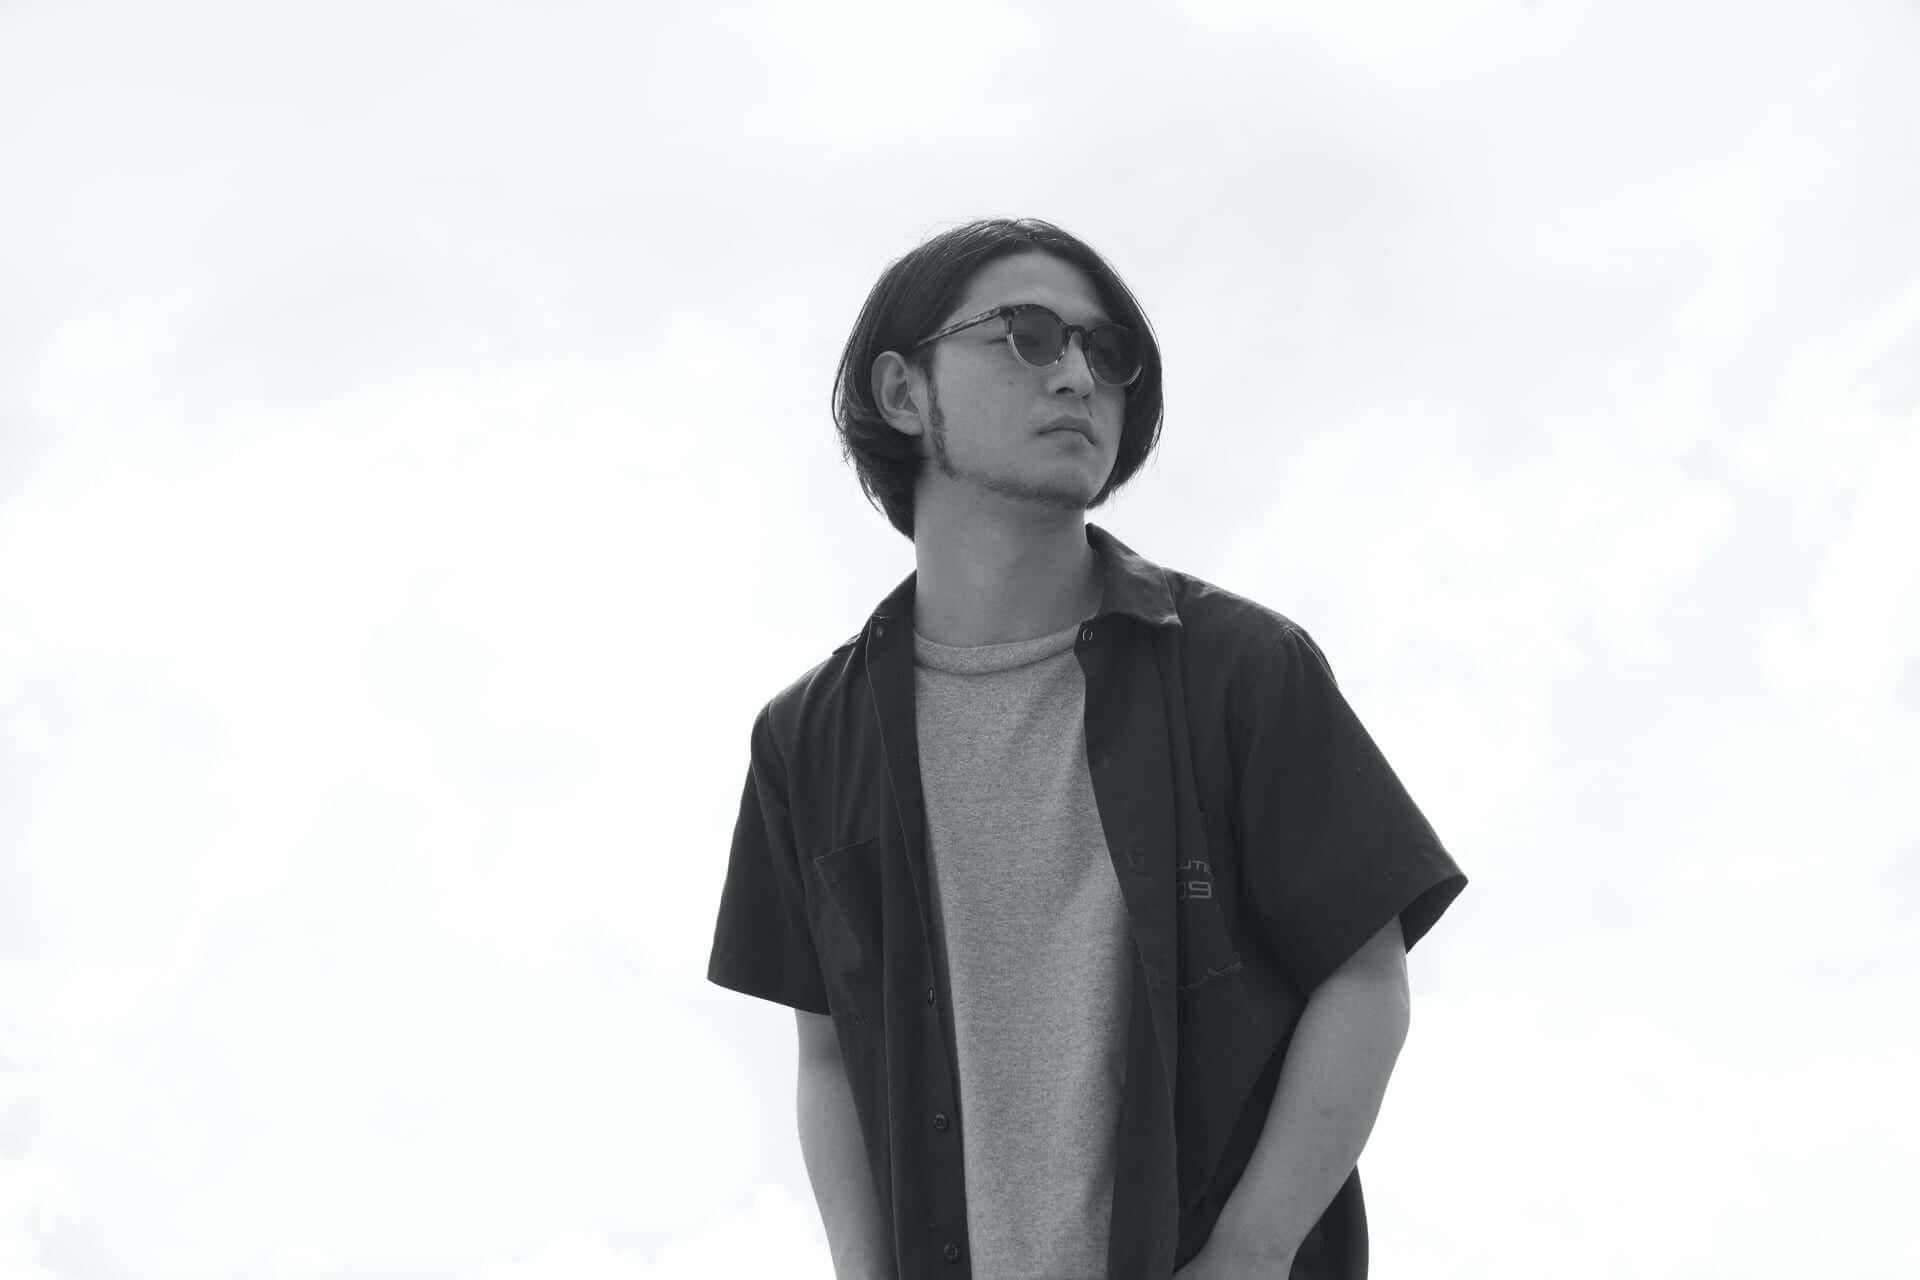 SOUNDS GOOD®とblock.fmによるコンピアルバムがリリース|80KIDZ、TAAR、Shin Sakiuraの楽曲が収録 music200603_feelsoundsgood_13-1920x1280